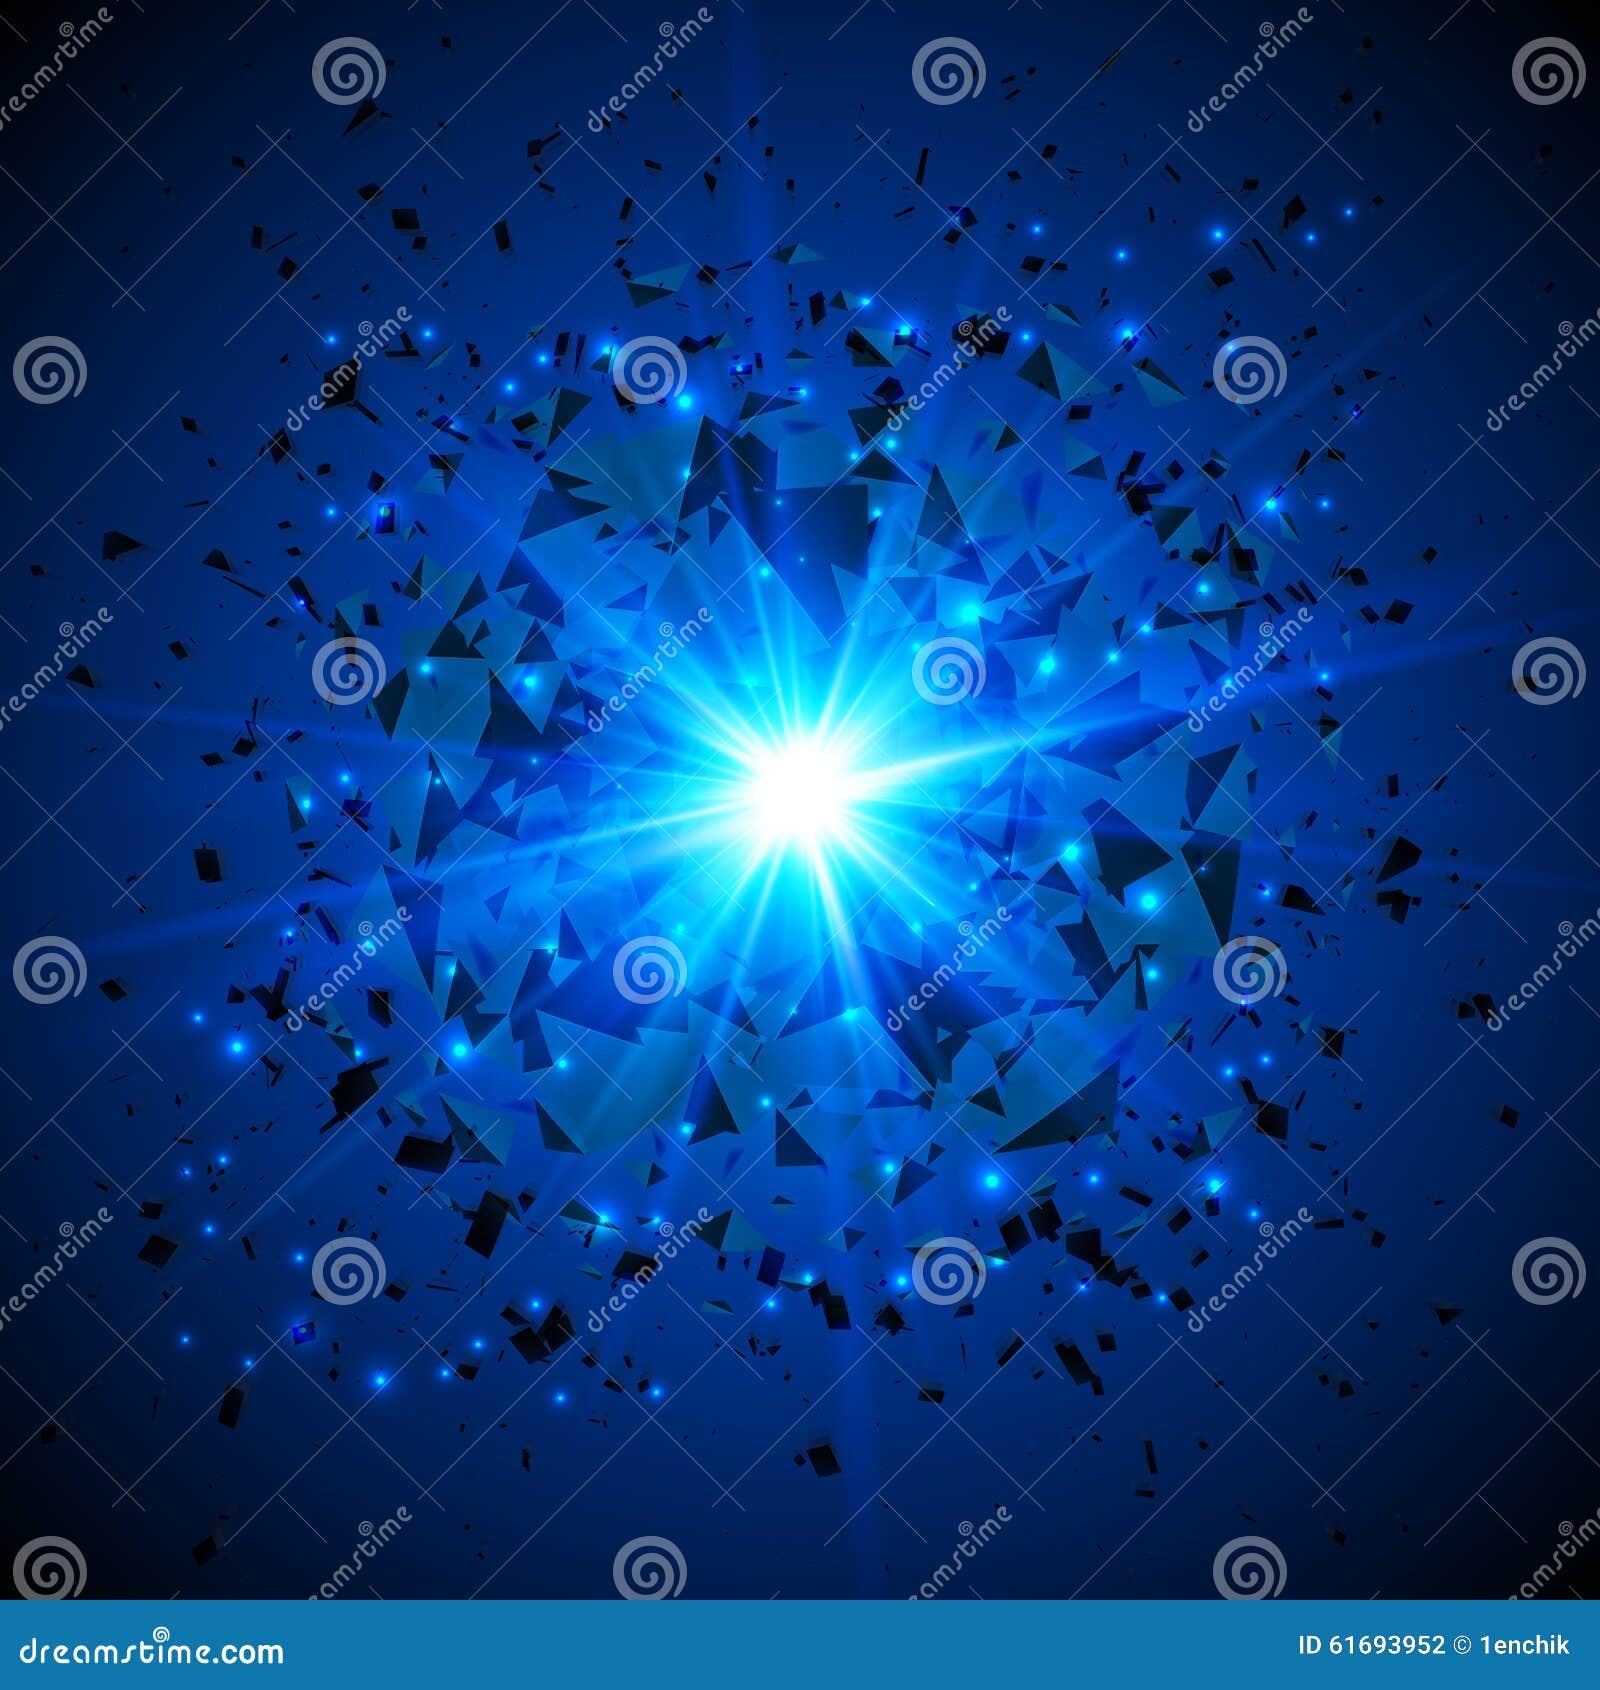 Blue Flaming Vector Meteor Cosmic Explosion Stock Vector ...